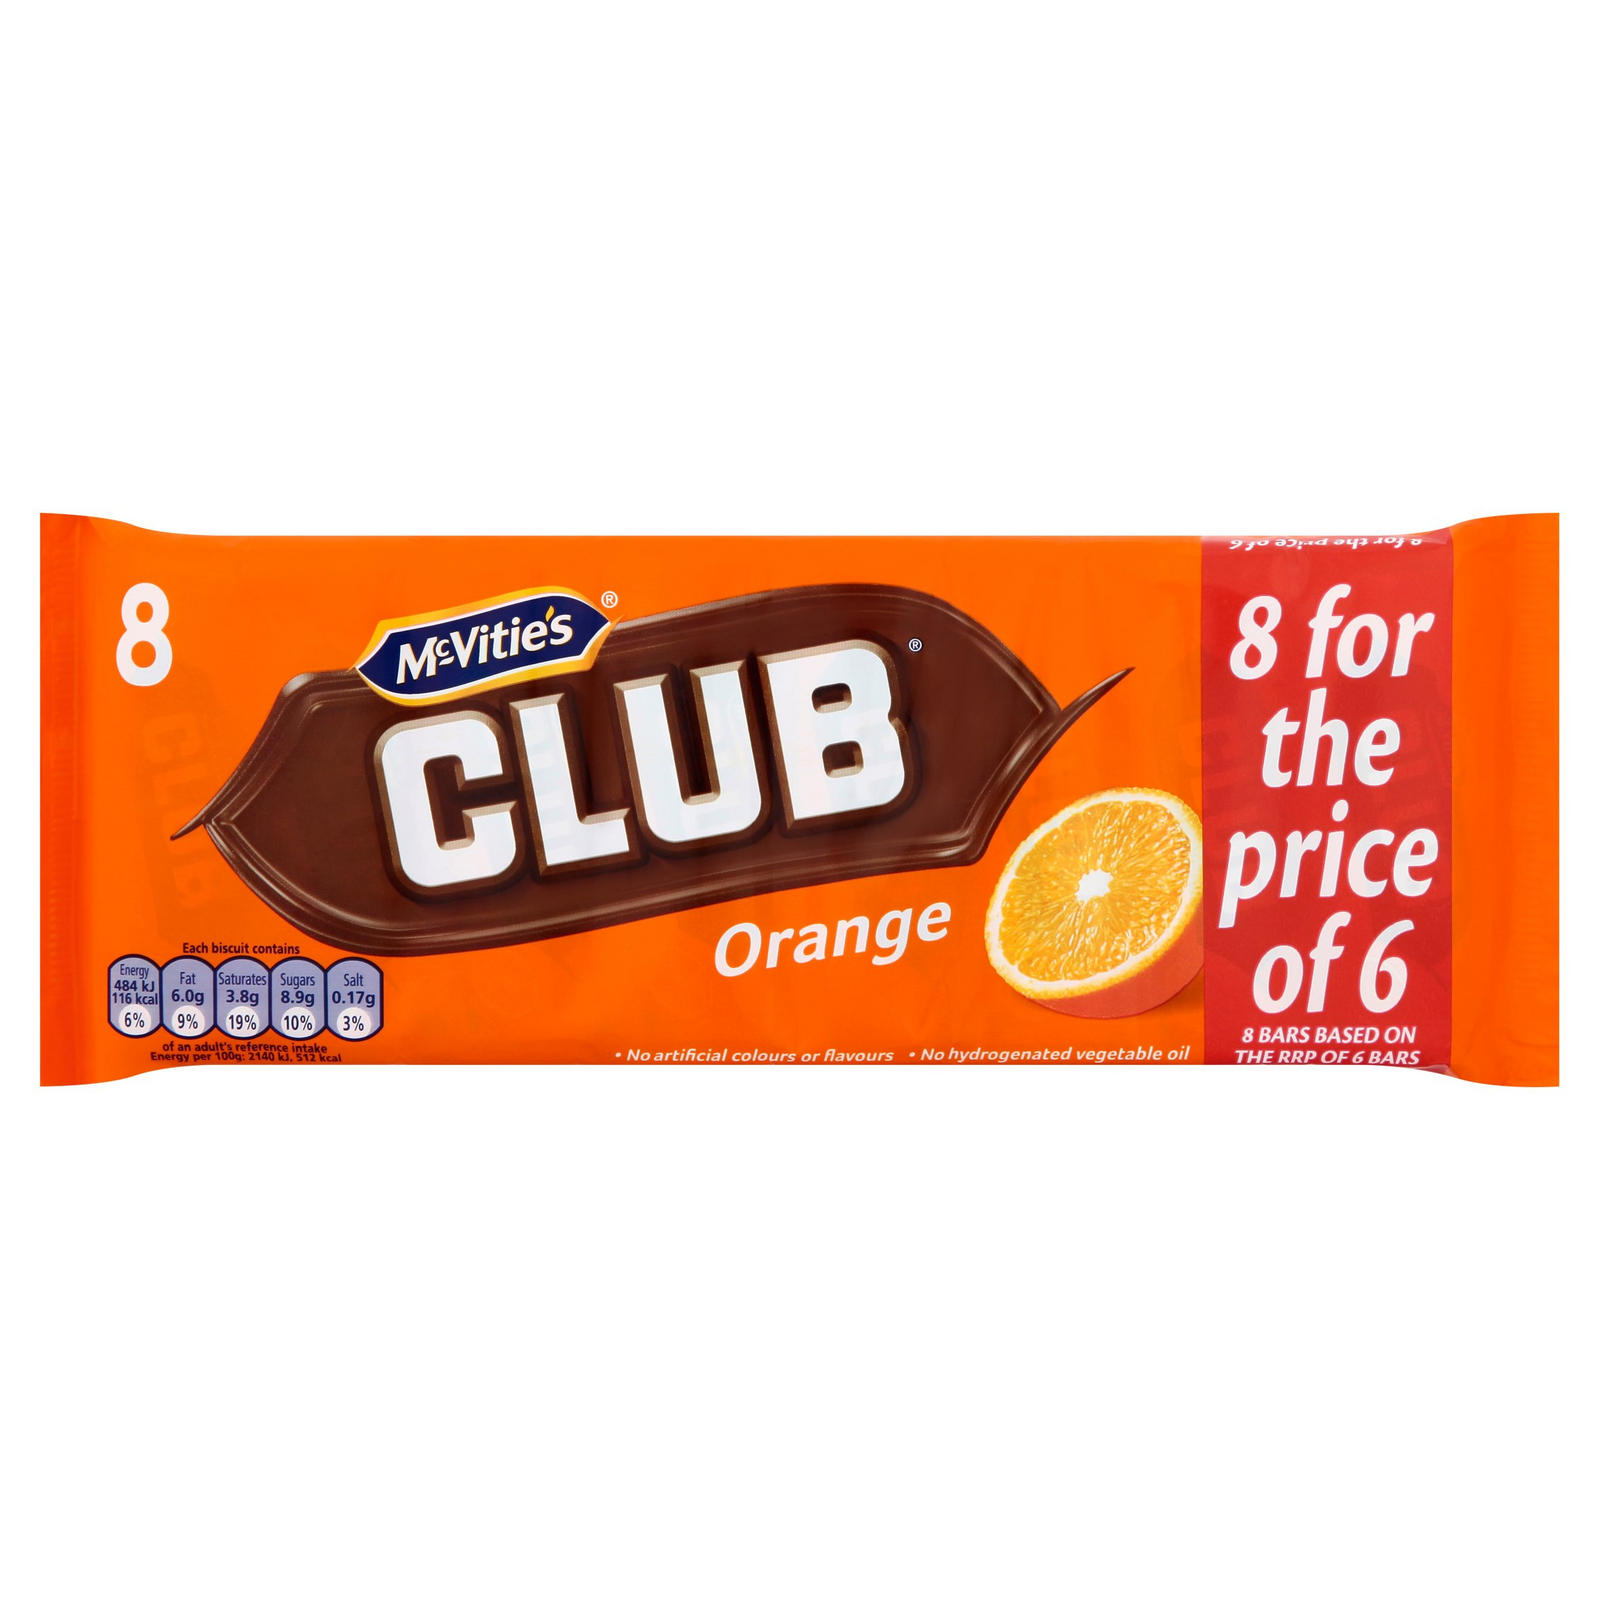 Mcvities Club Orange 8 X 22g 176g Multipack Biscuits